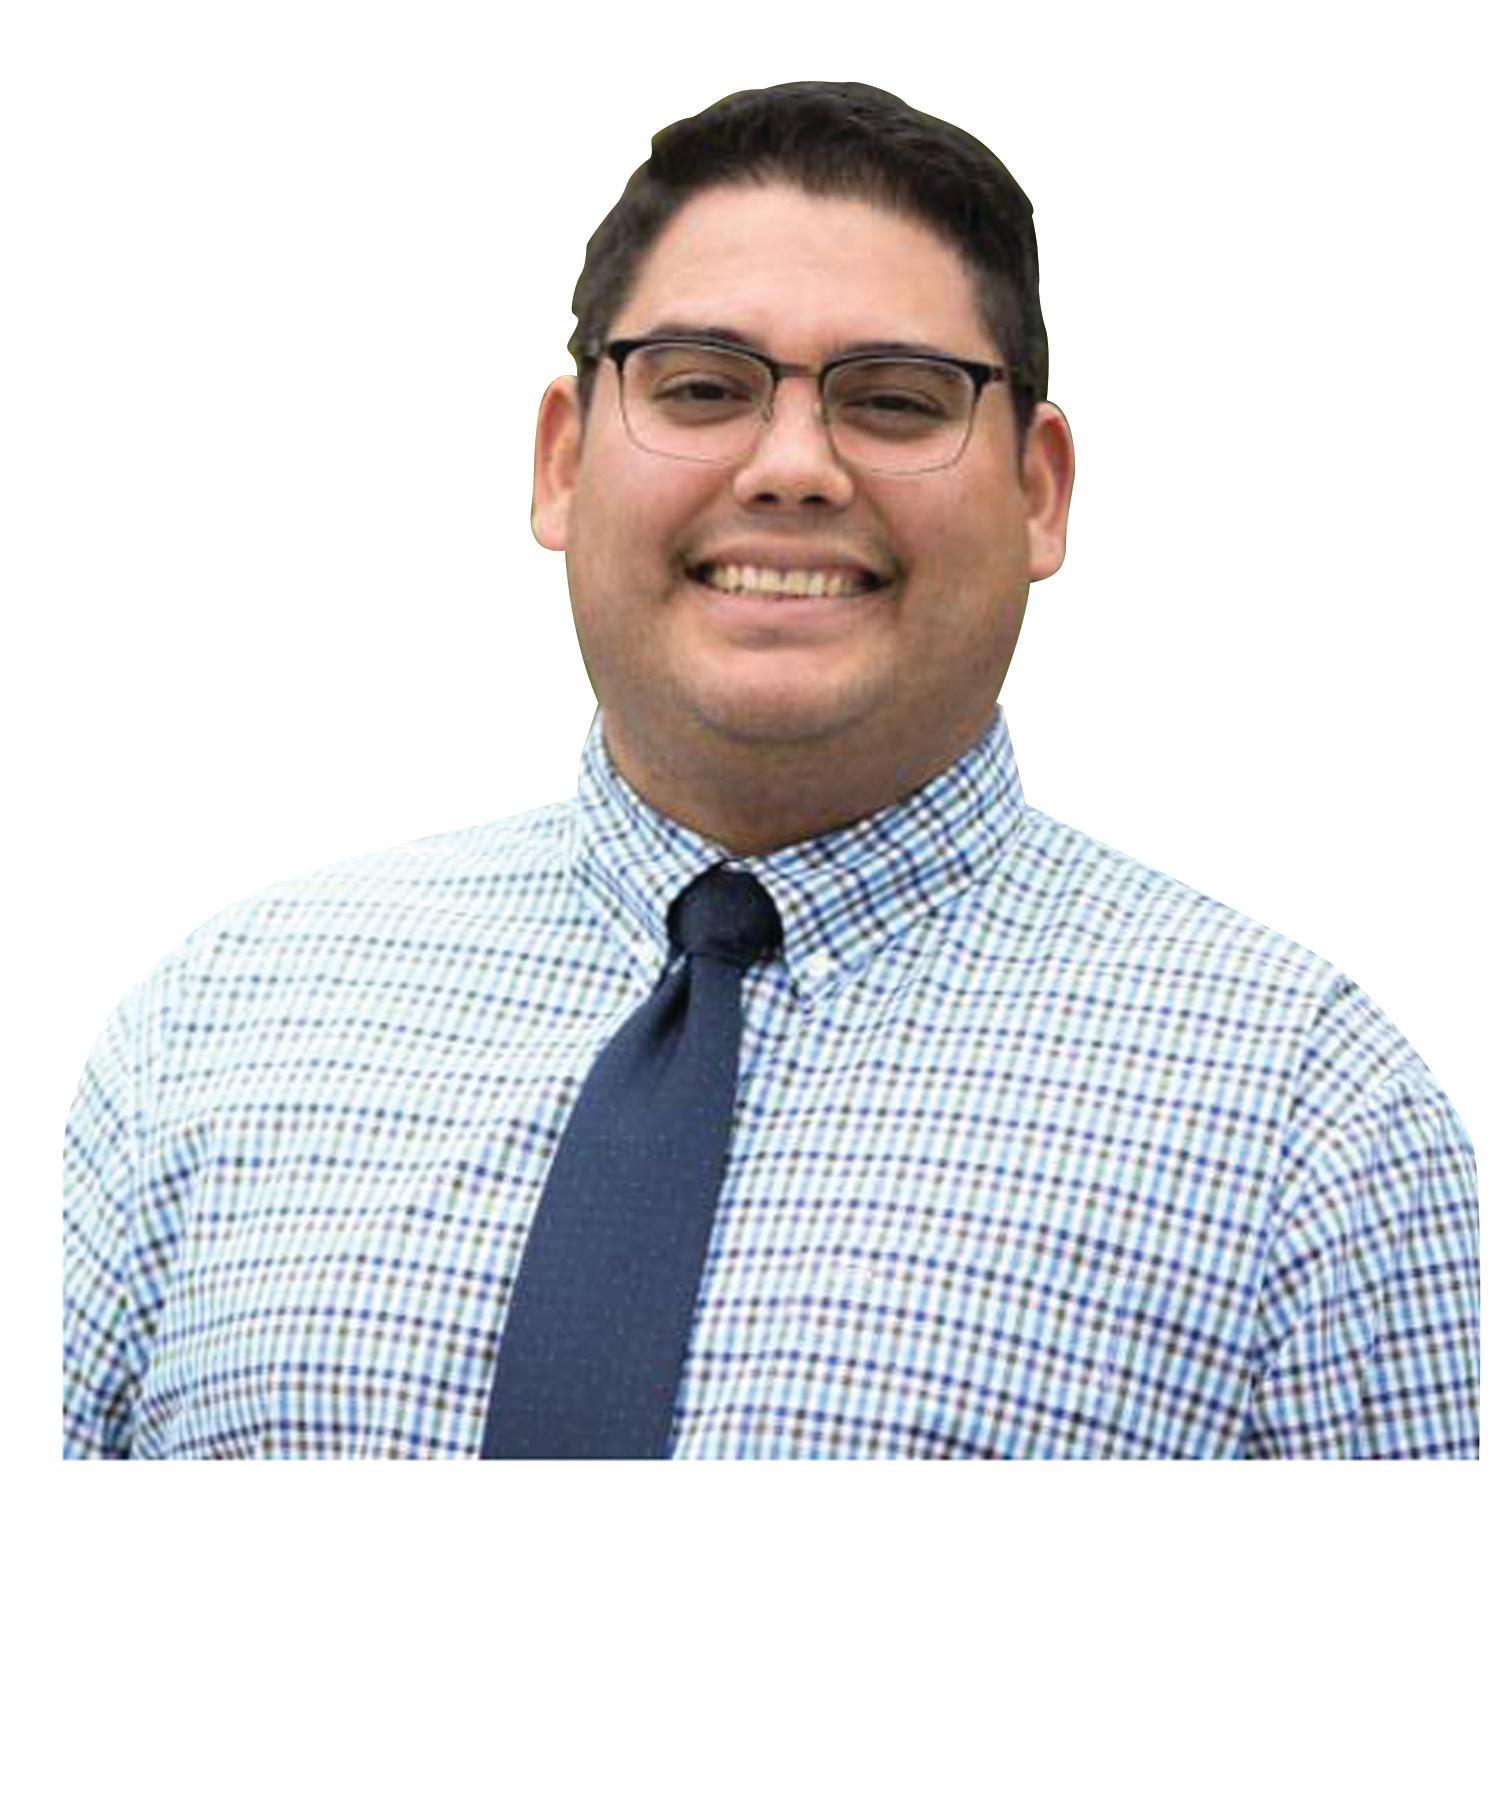 Dr. Ruben Espinoza